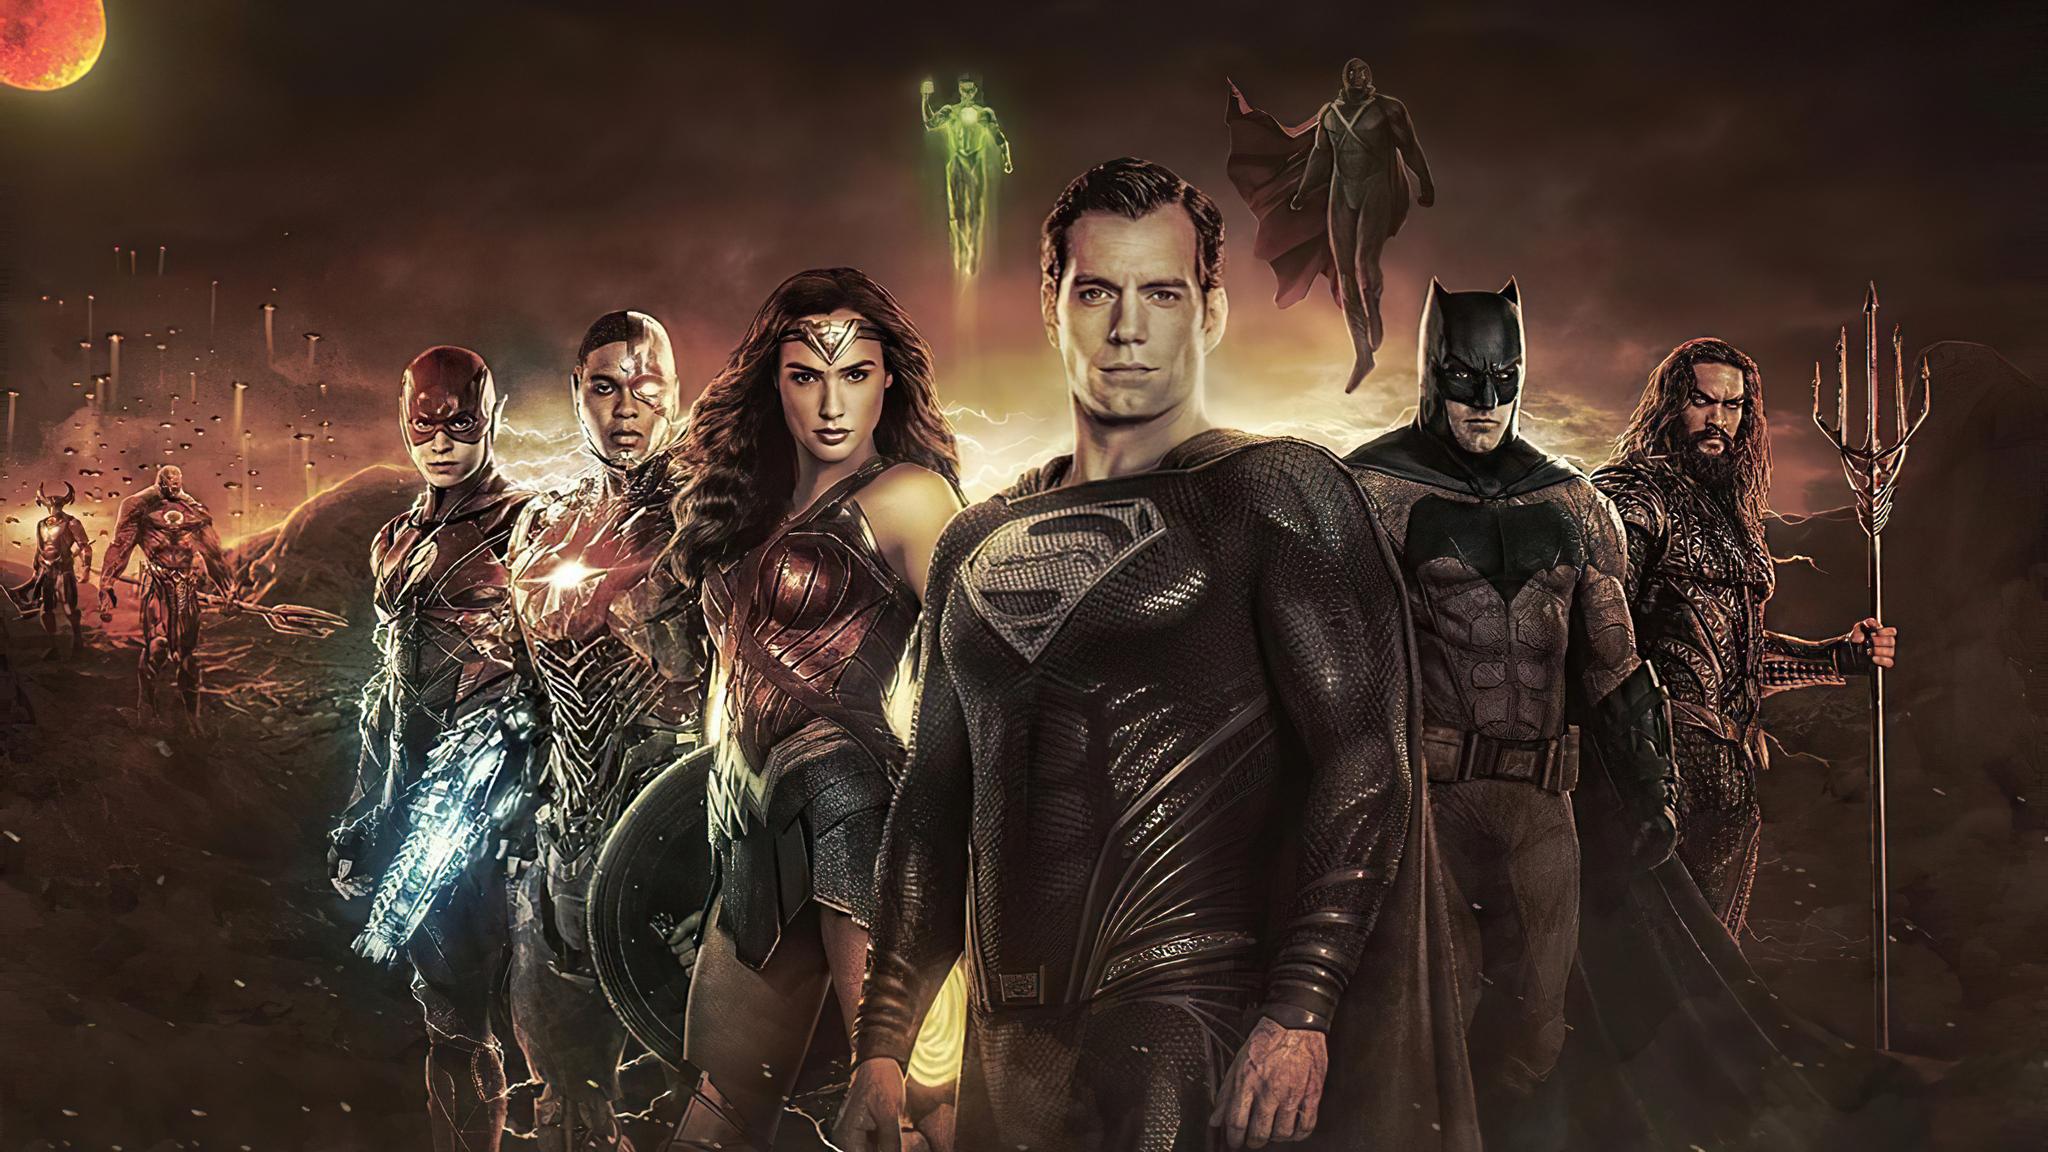 2048x1152 Justice League 2020 4k 2048x1152 Resolution HD ...